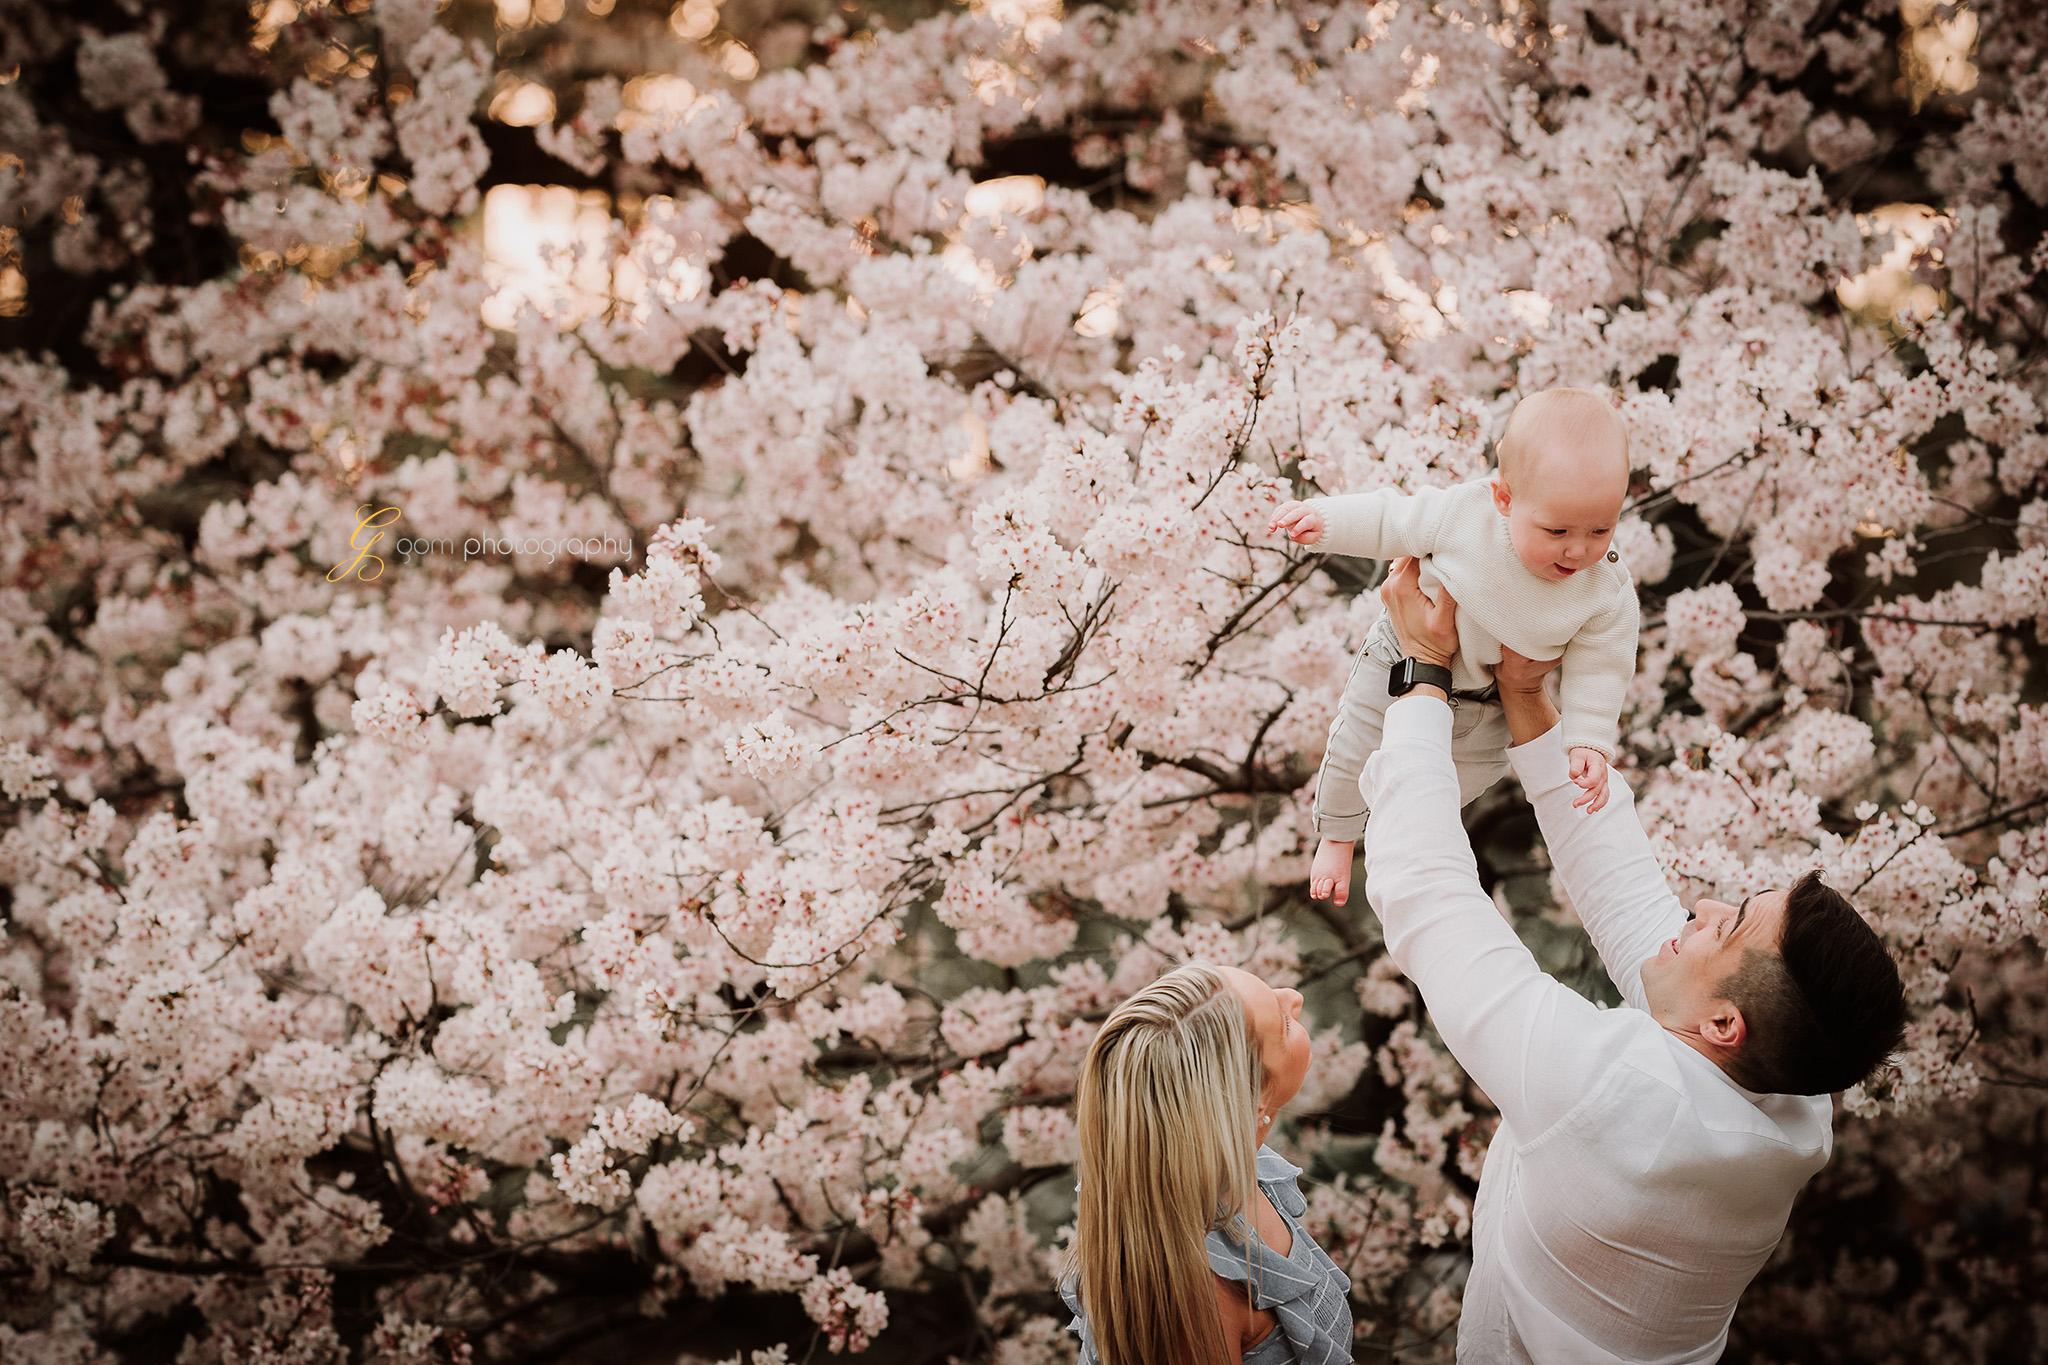 tokyo_photographer_cherry_blossom 5